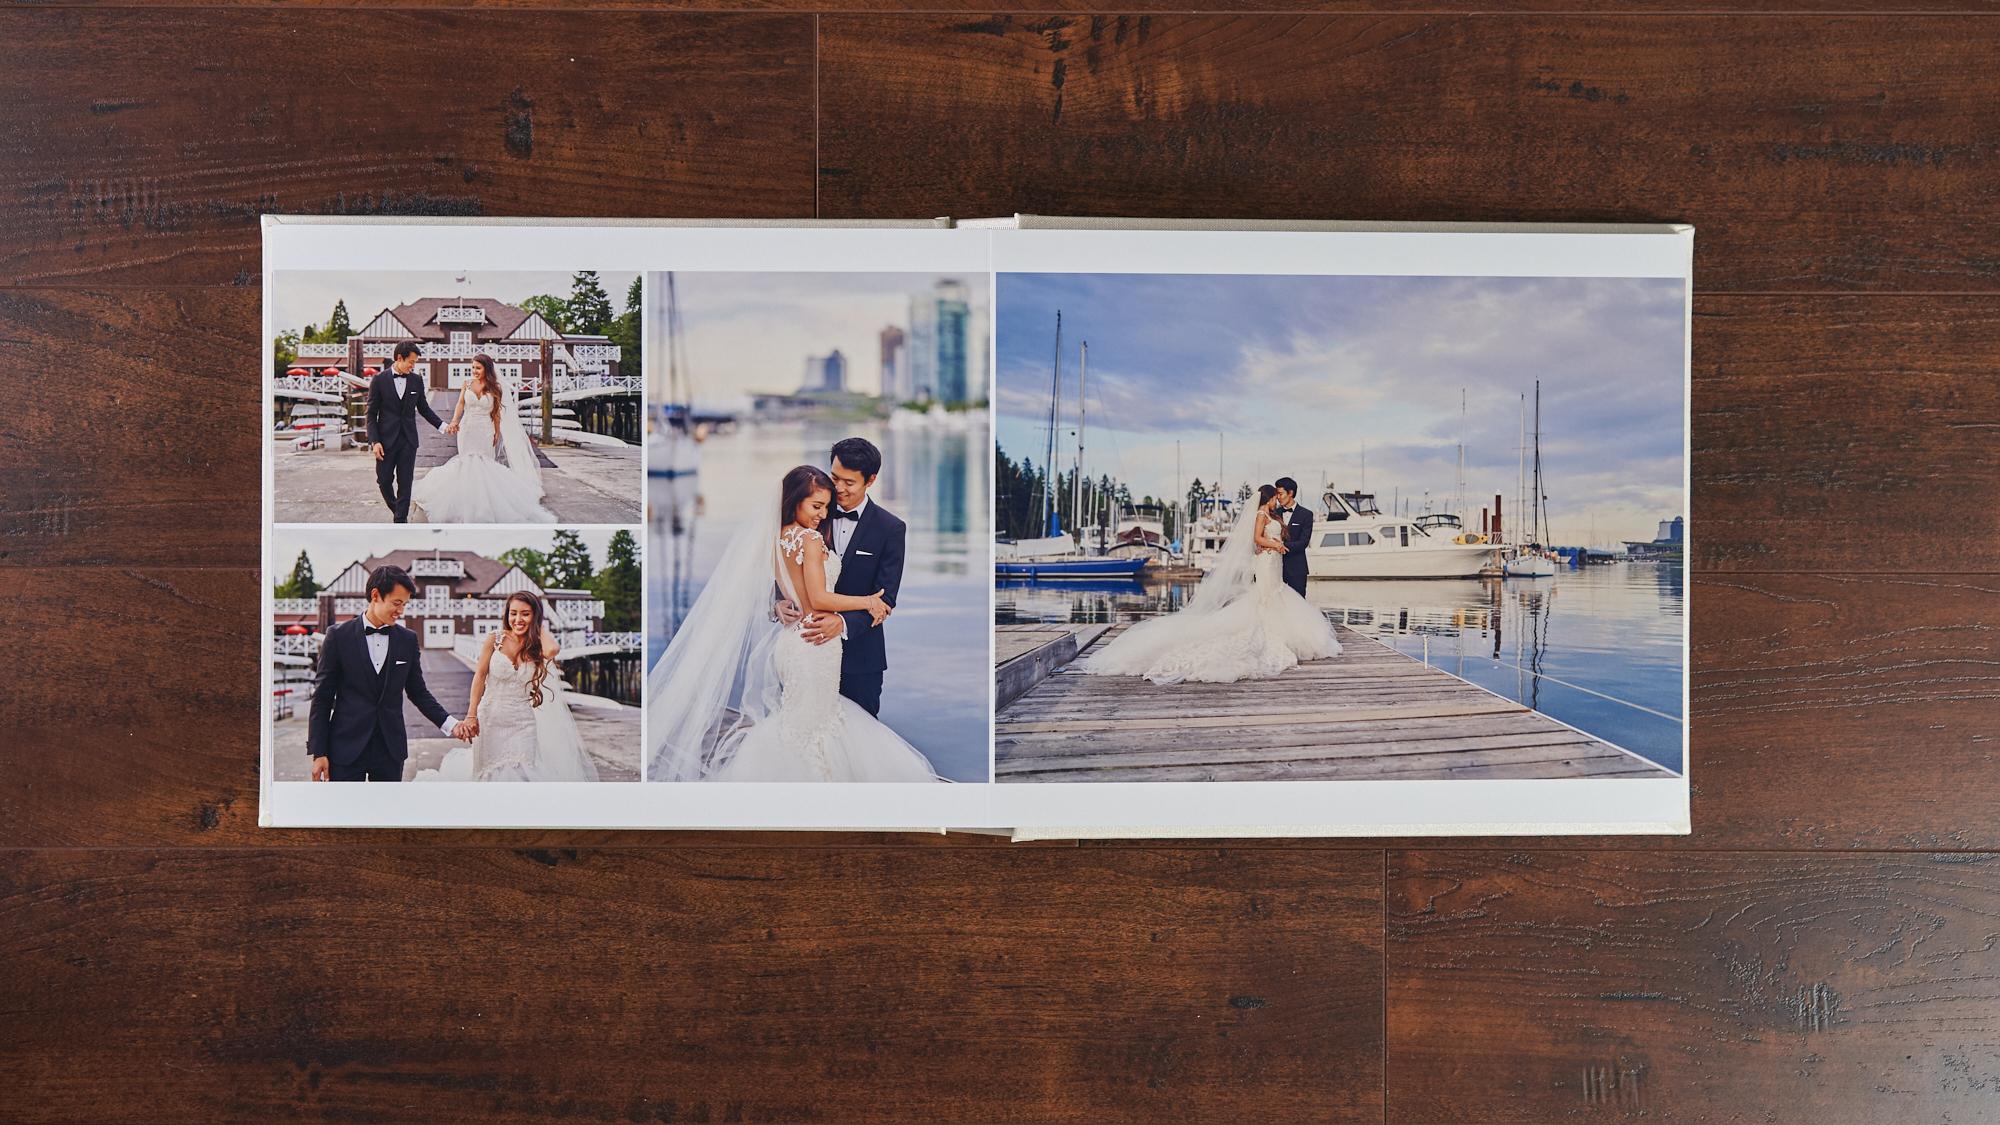 Anita & JC Wedding Album 0022.jpg